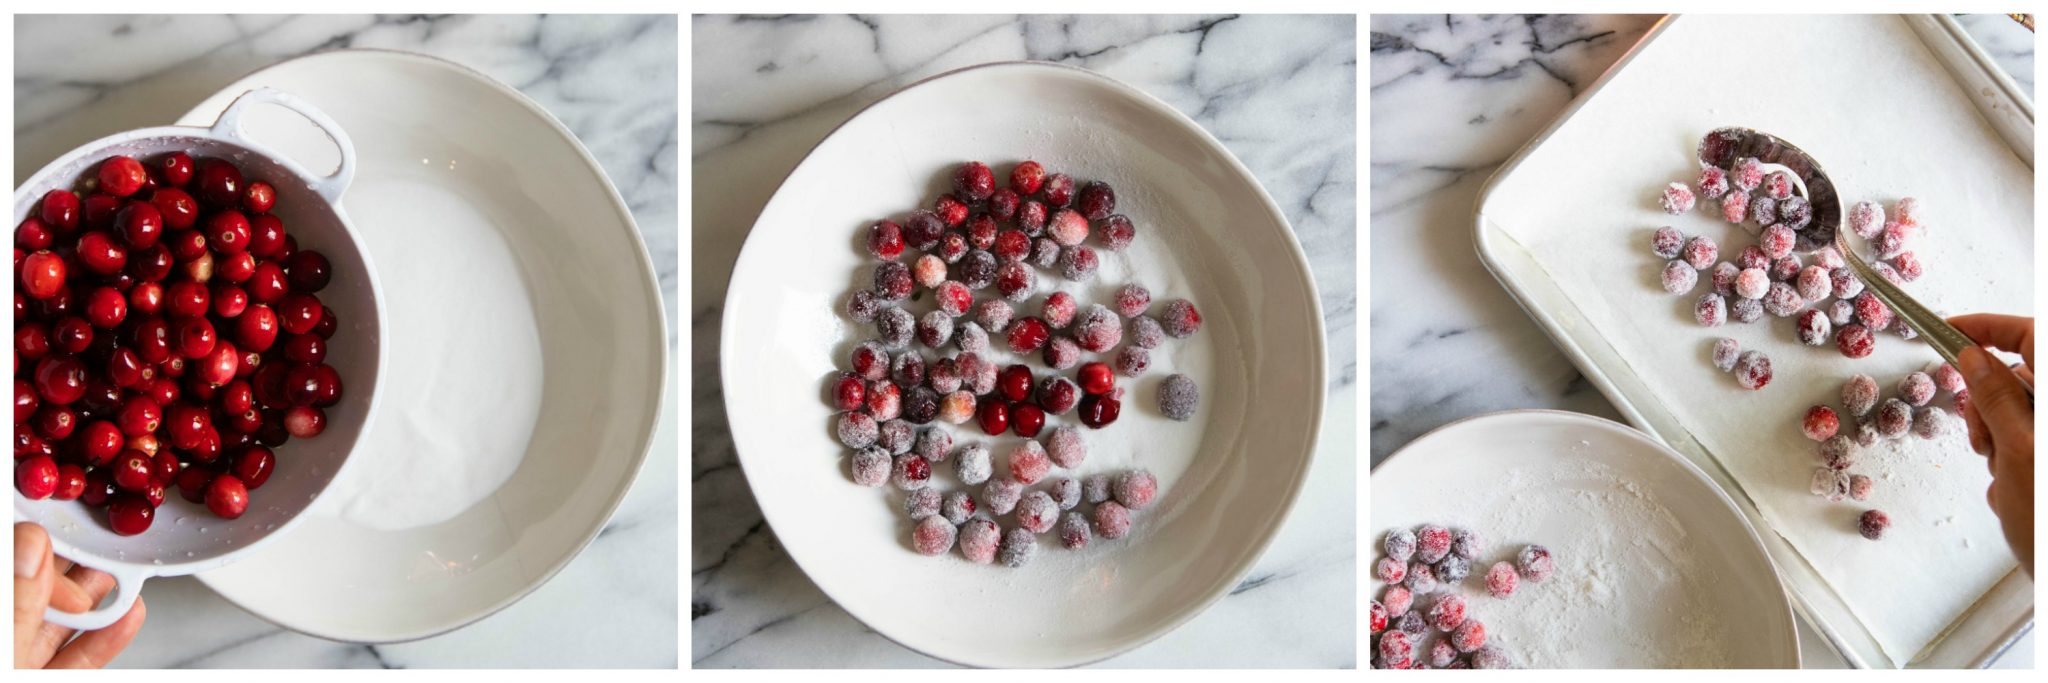 cranberries being rolled in sugar